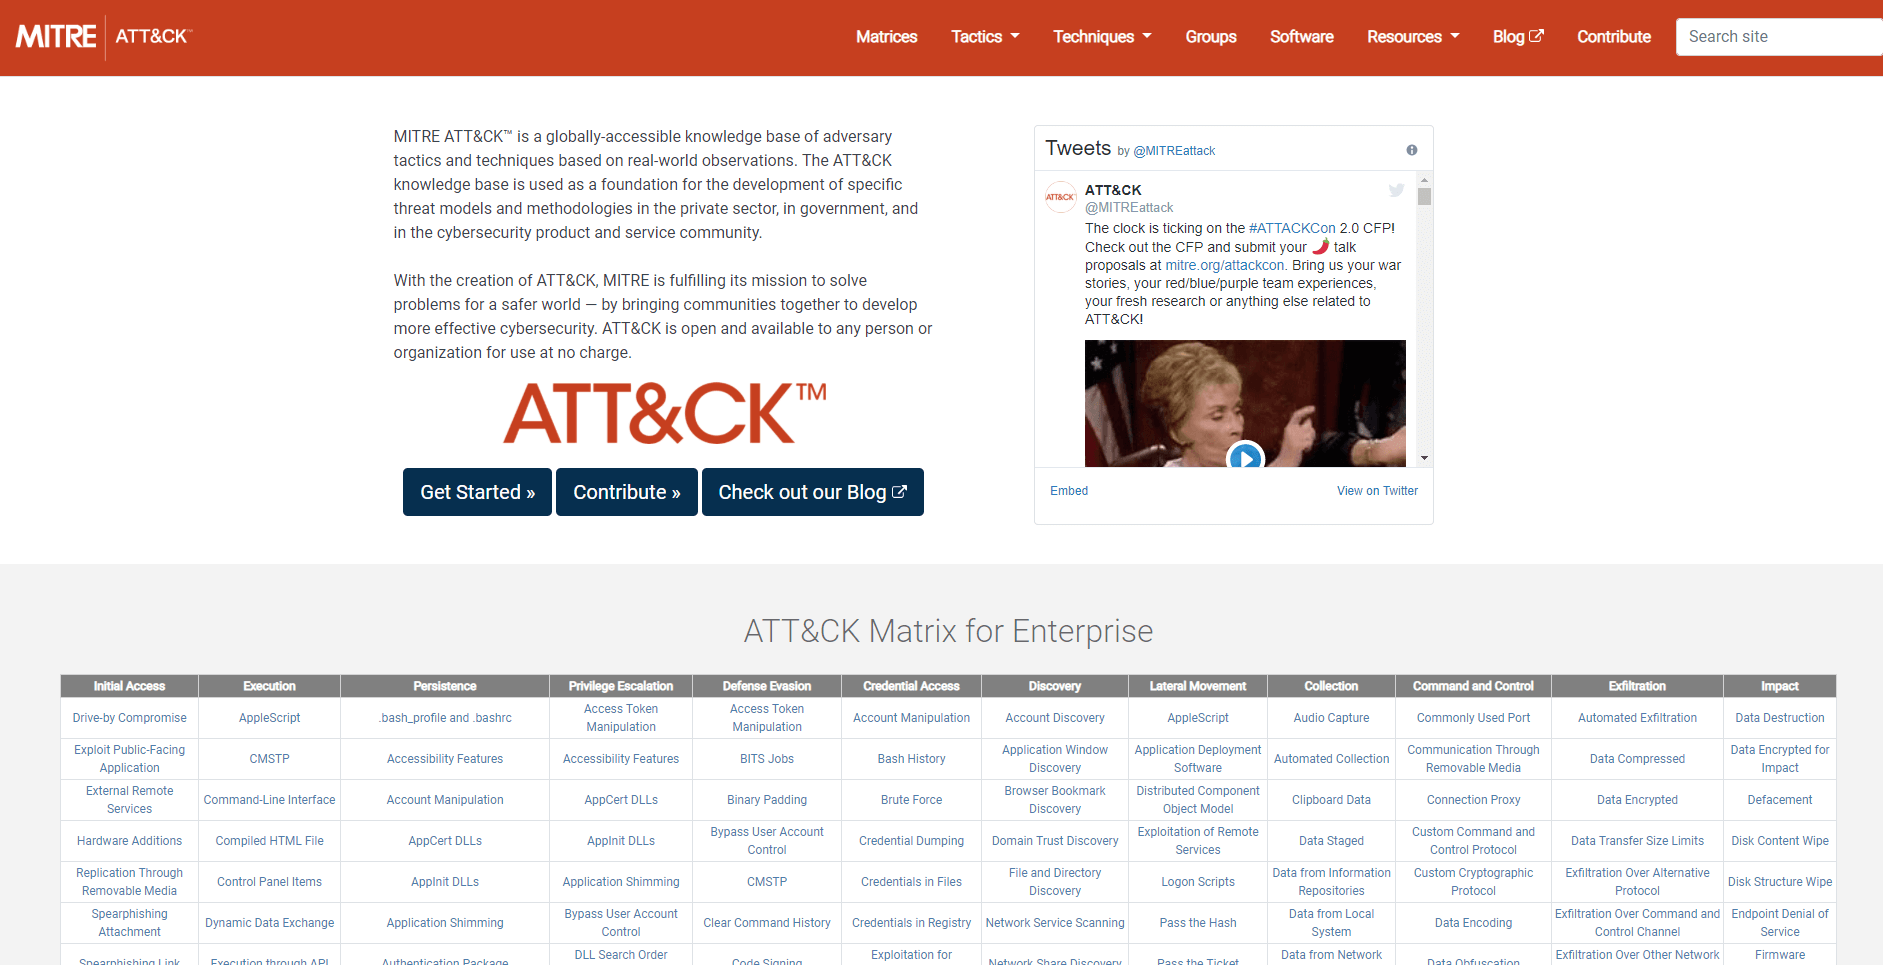 Ukázka matice MITRE ATTA&CK